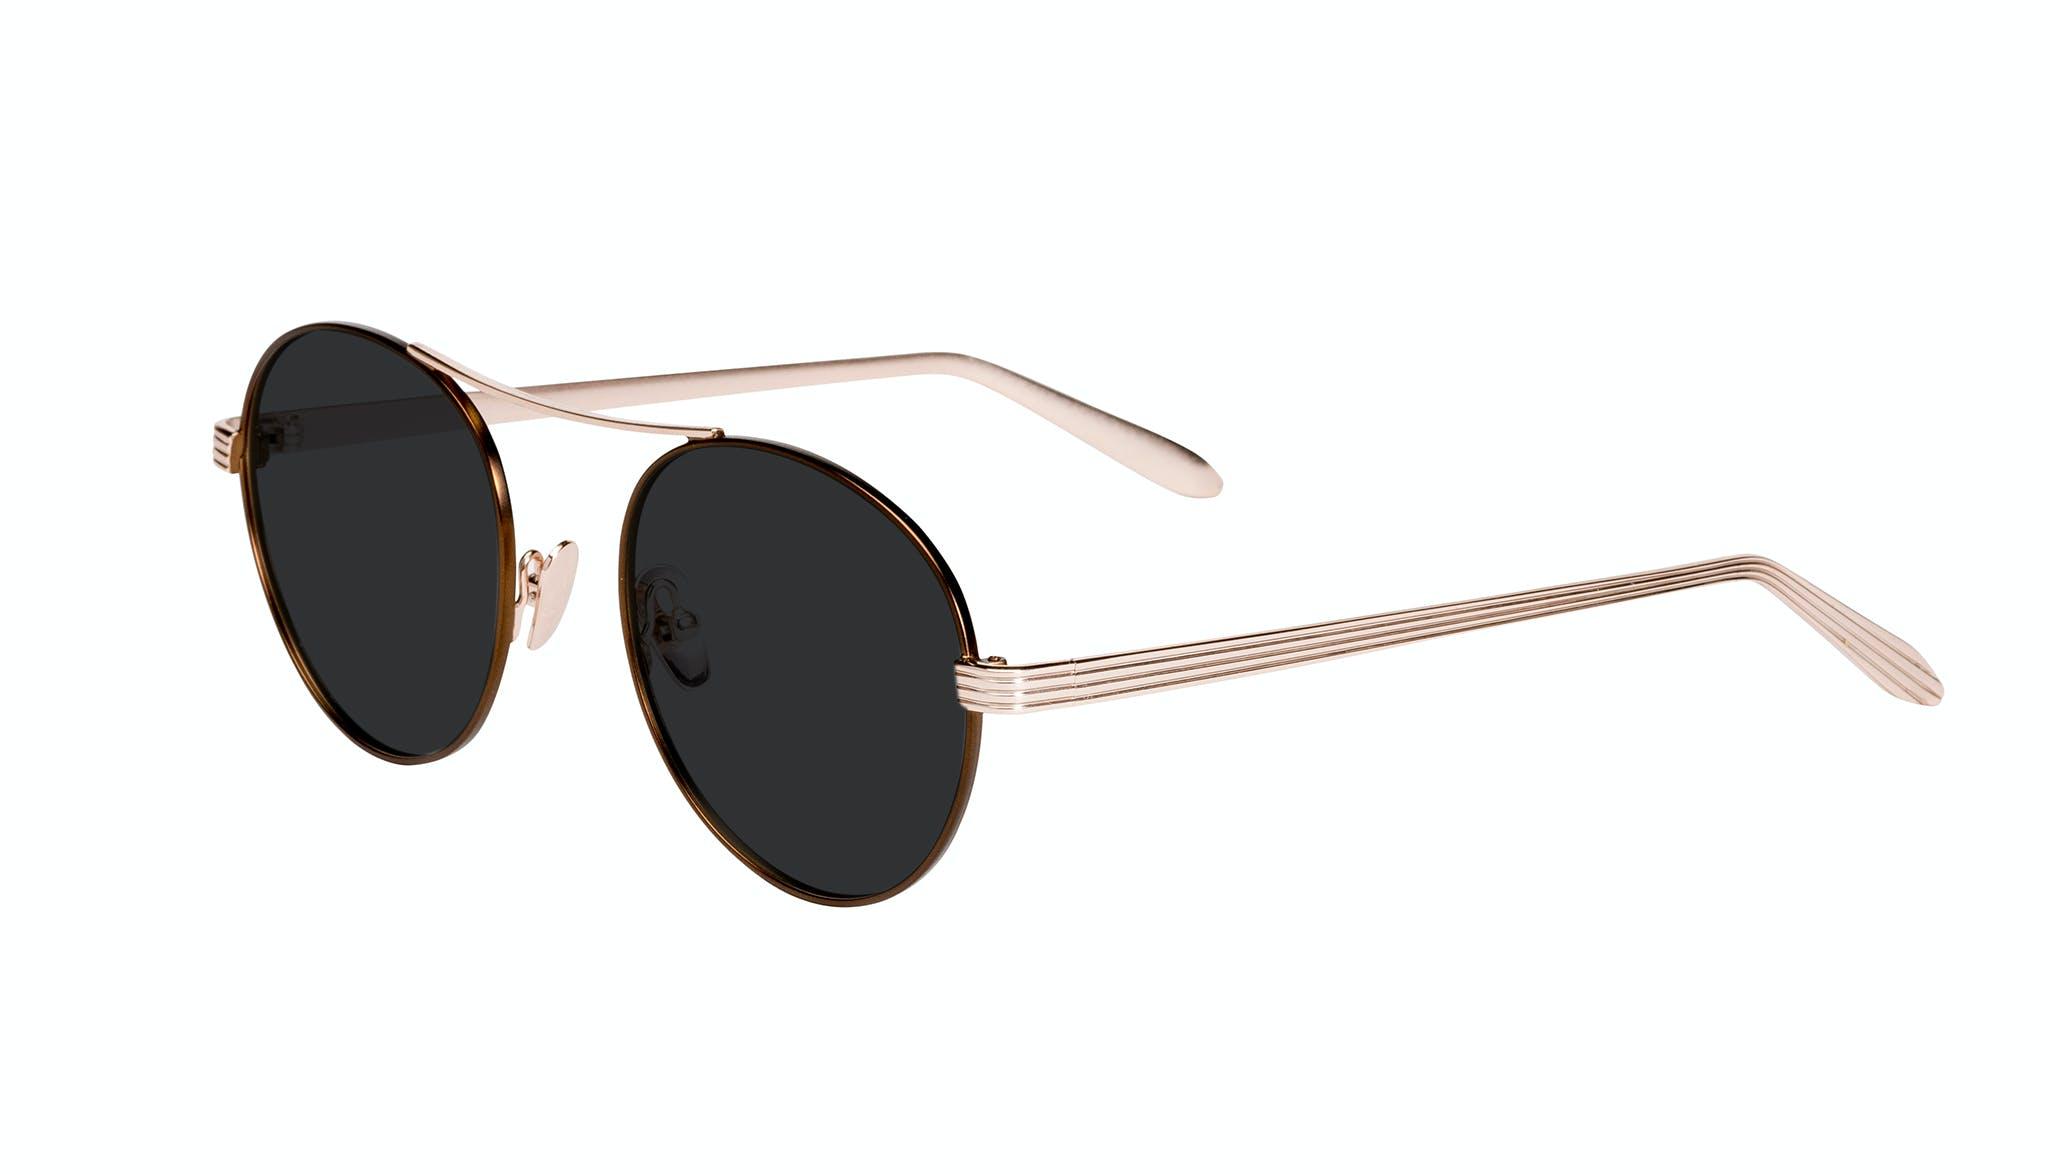 Affordable Fashion Glasses Round Sunglasses Women Prize Golden Lilac Tilt